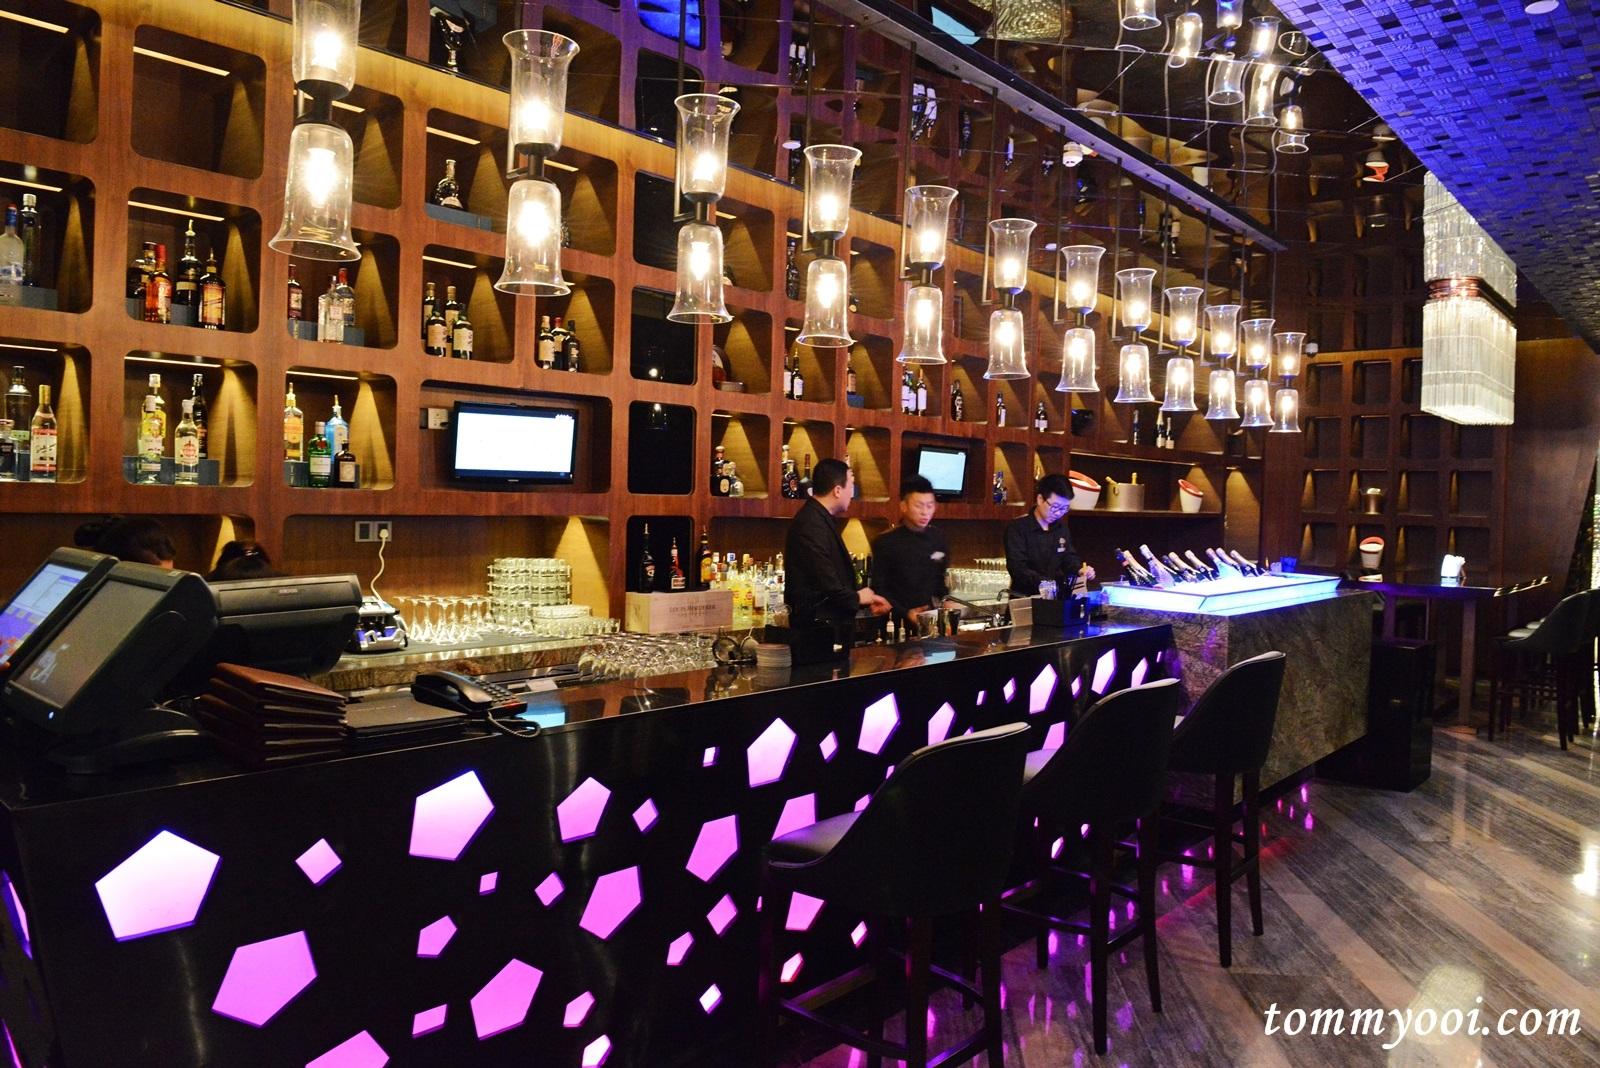 Eden Garden Rooftop Bar, Hilton Shenzhen - Tommy Ooi Travel Guide